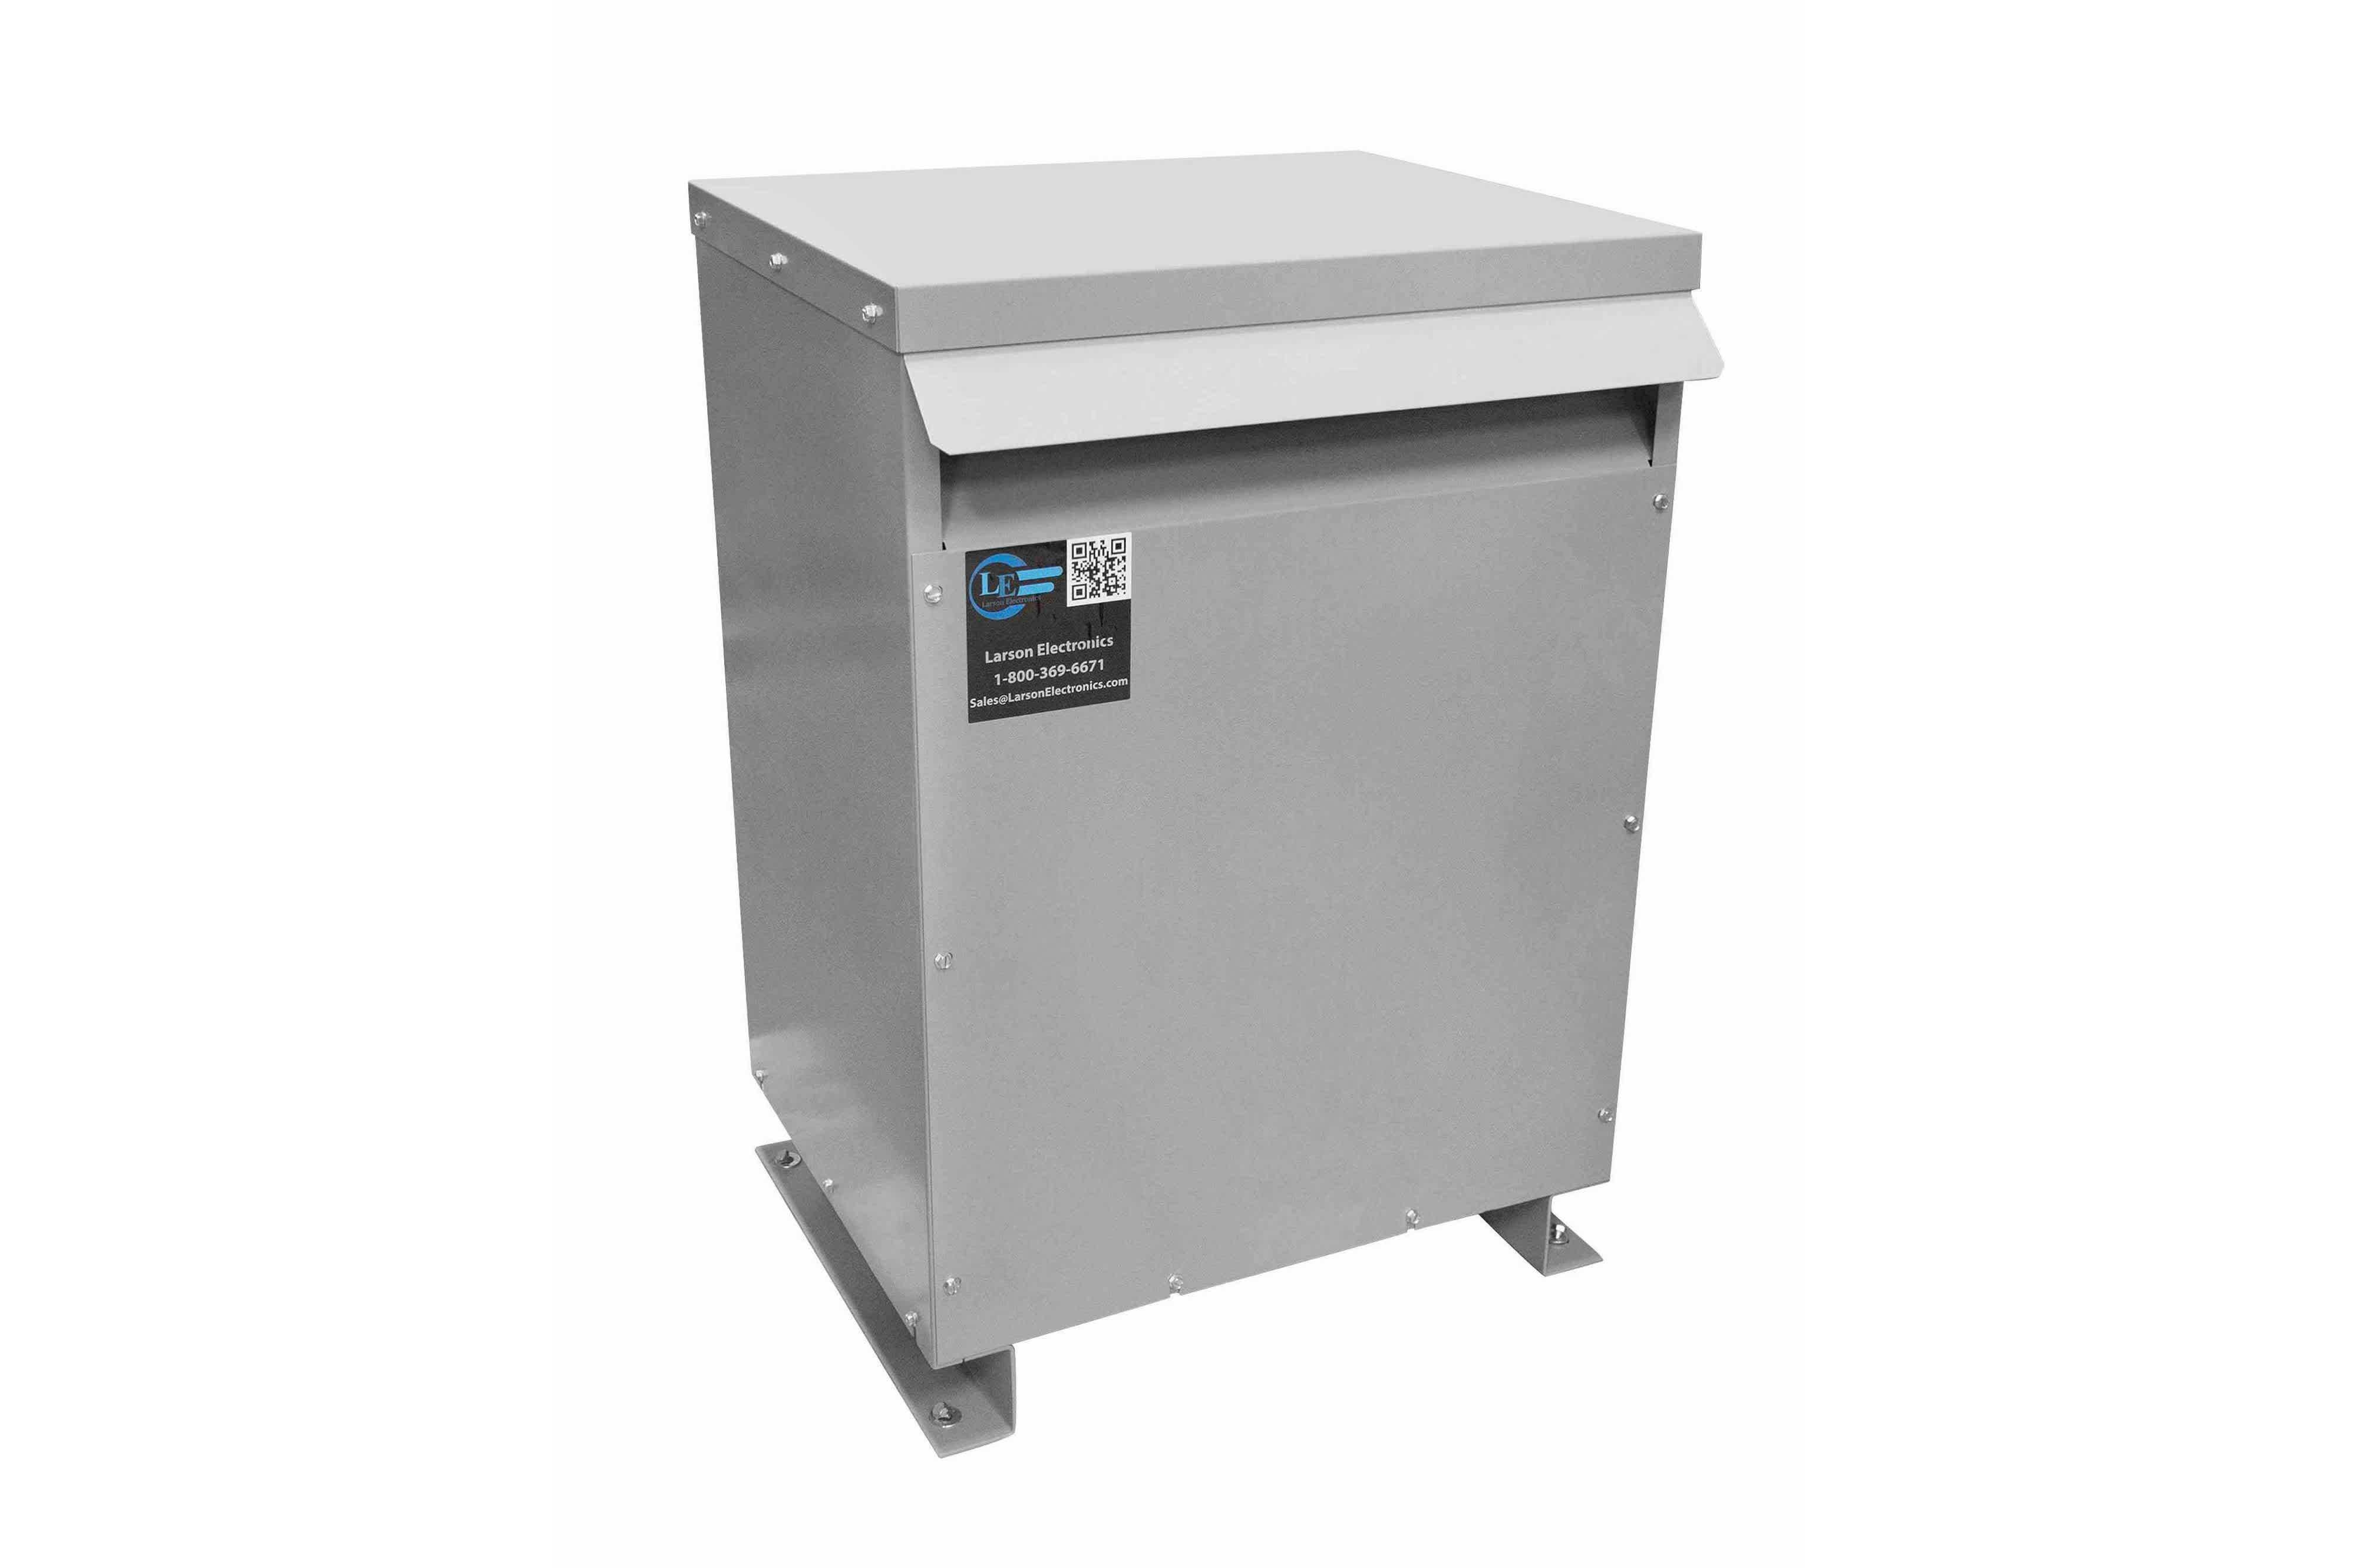 110 kVA 3PH Isolation Transformer, 480V Wye Primary, 400V Delta Secondary, N3R, Ventilated, 60 Hz